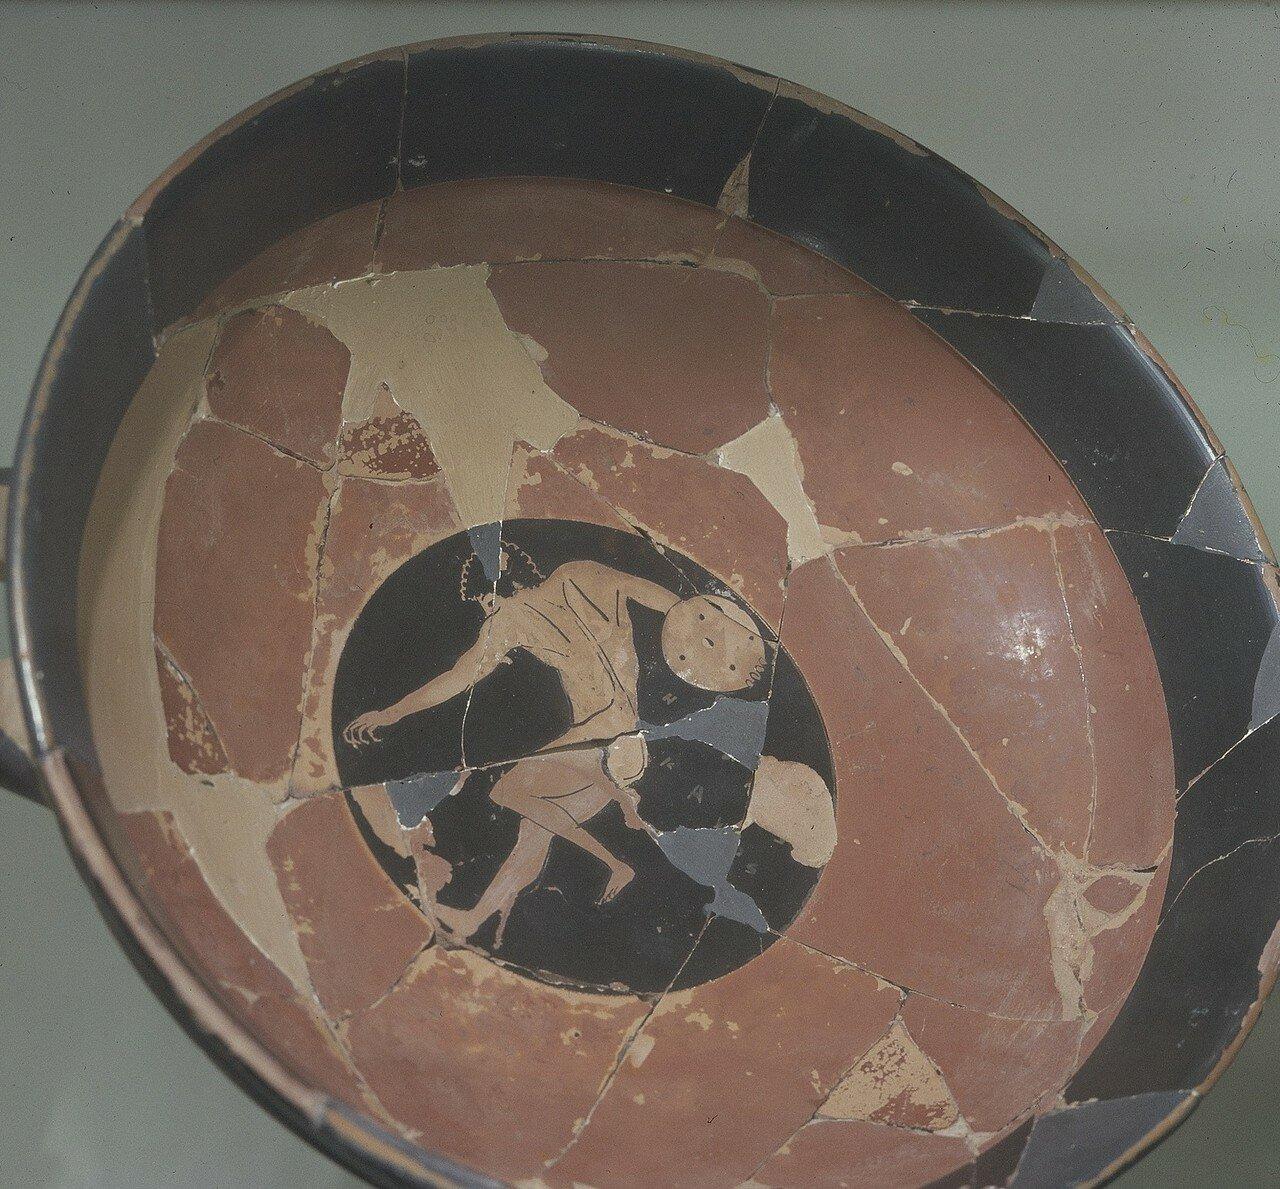 Афины. Археологический музей Афинской агоры